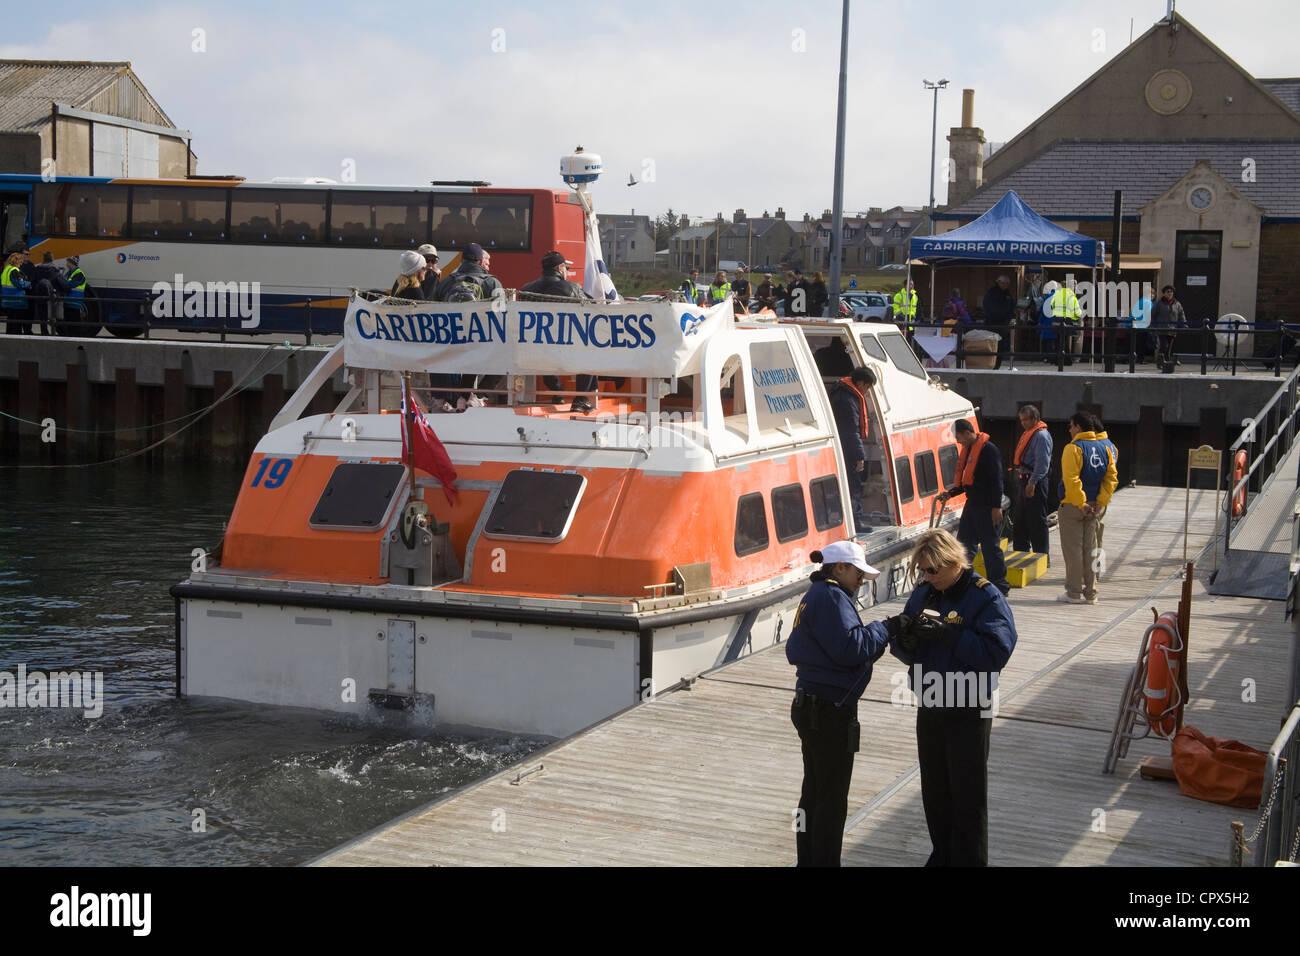 Kirkwall Orkney Islands UK Landing craft of Caribbean Princess cruise liner disembarking passengers for tour of - Stock Image